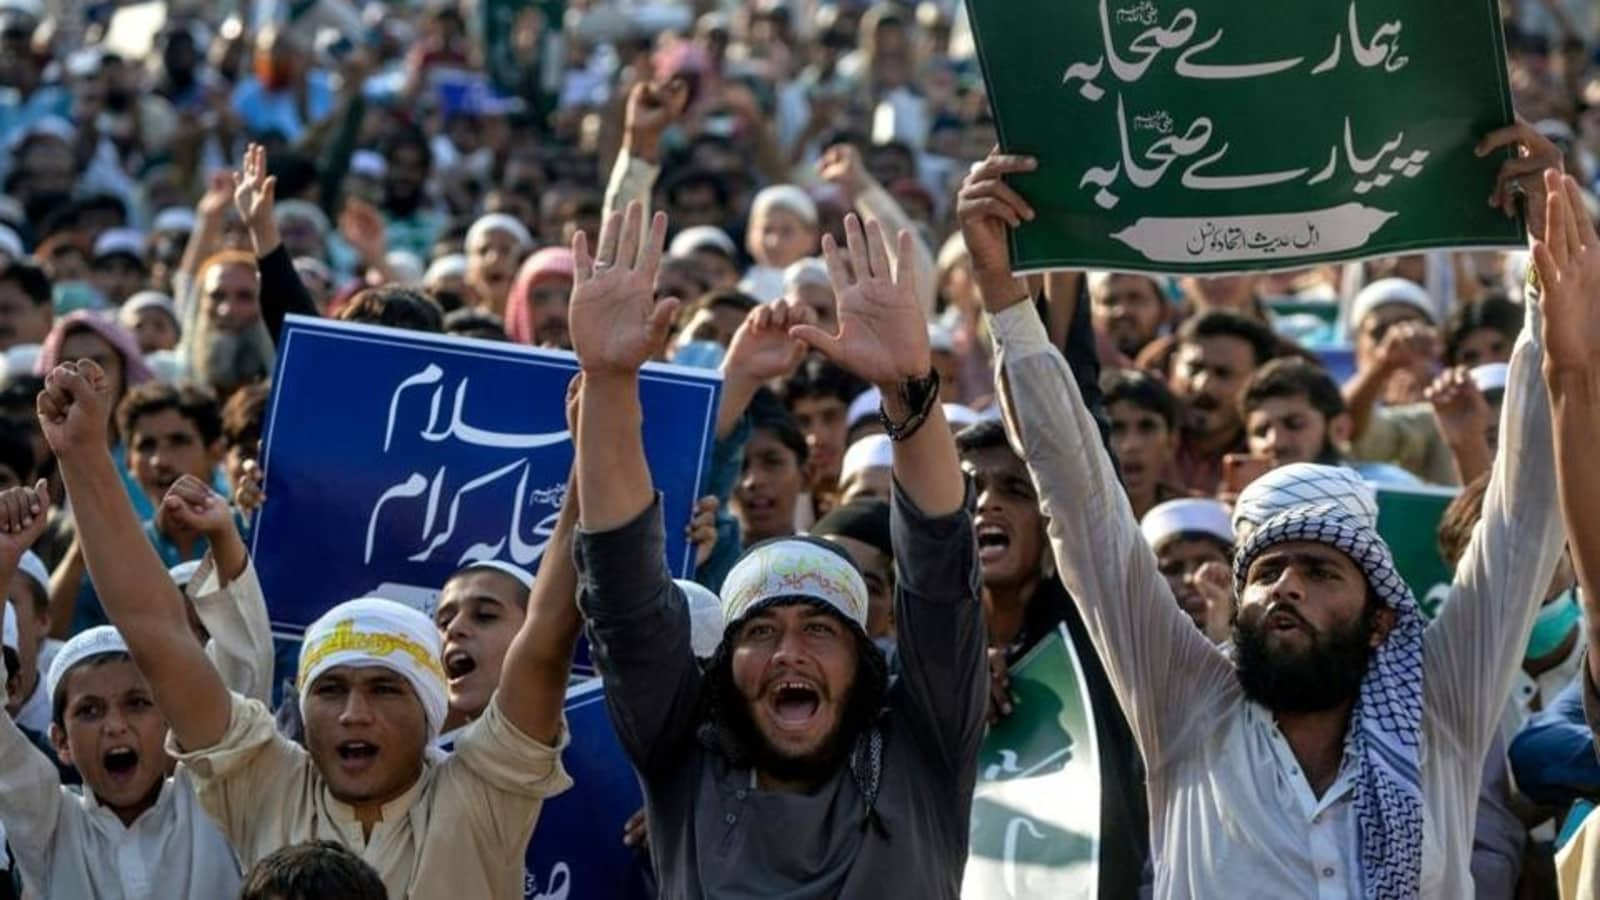 Pak woman principal sentenced to death for committing blasphemy | World  News - Hindustan Times